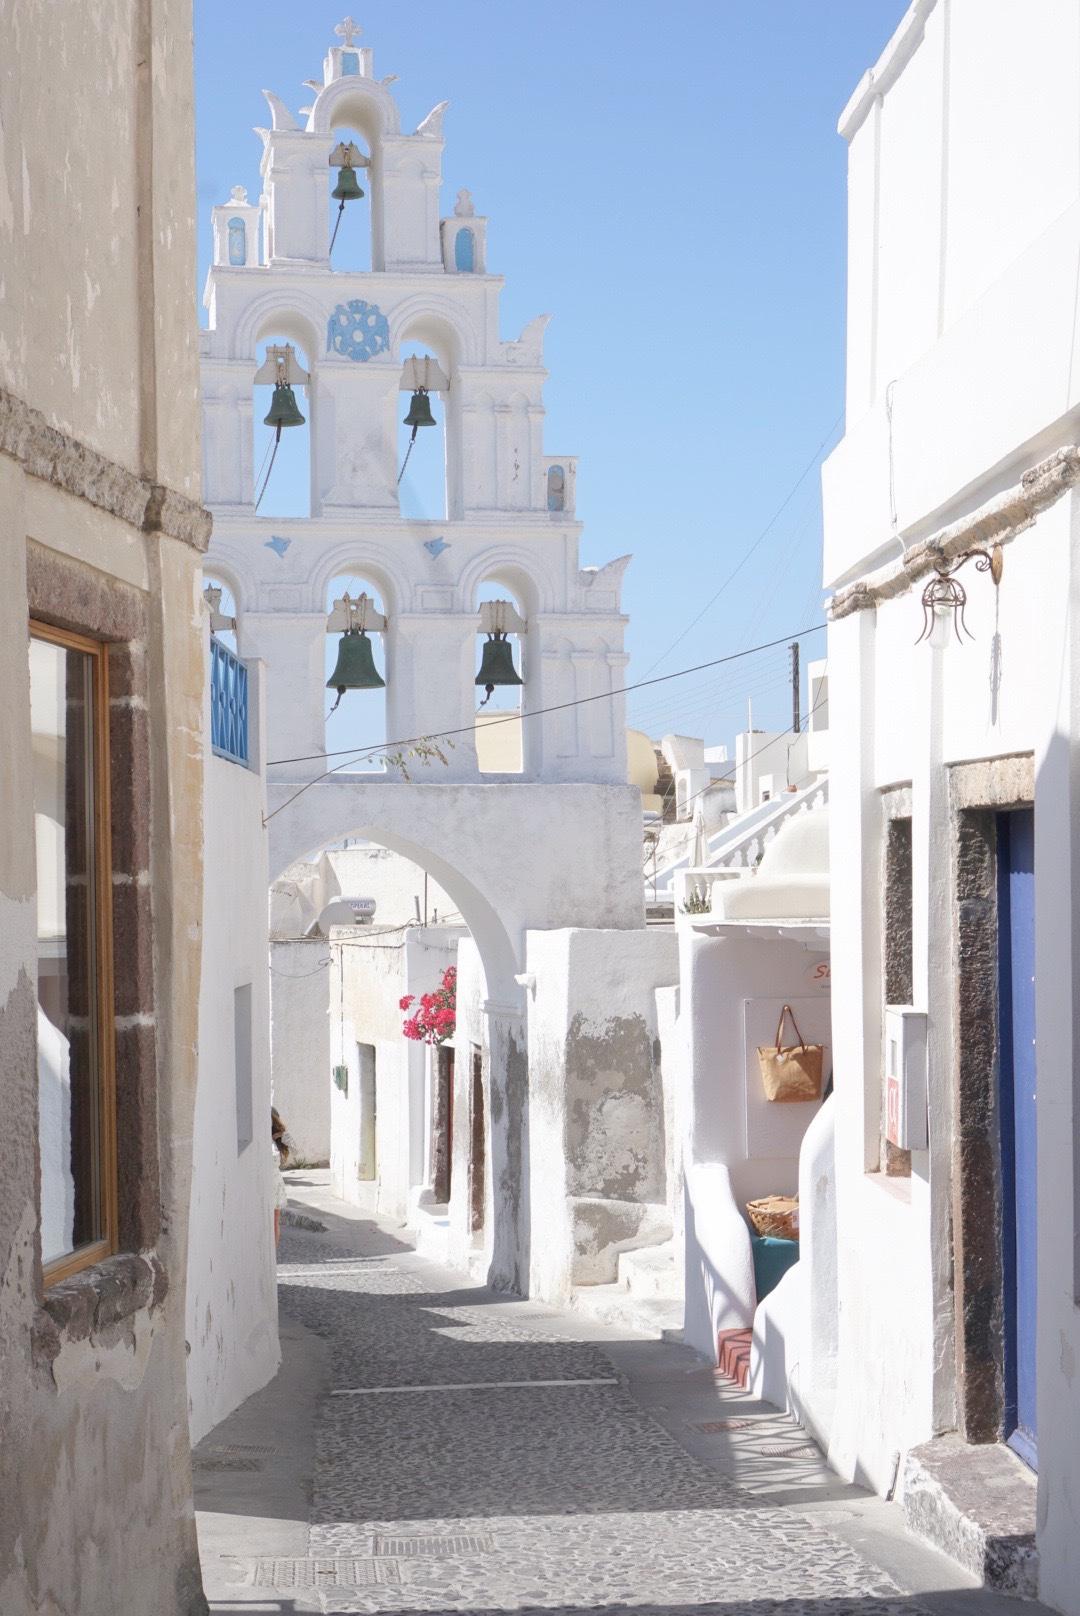 acs 0285 - A Few Days in Santorini